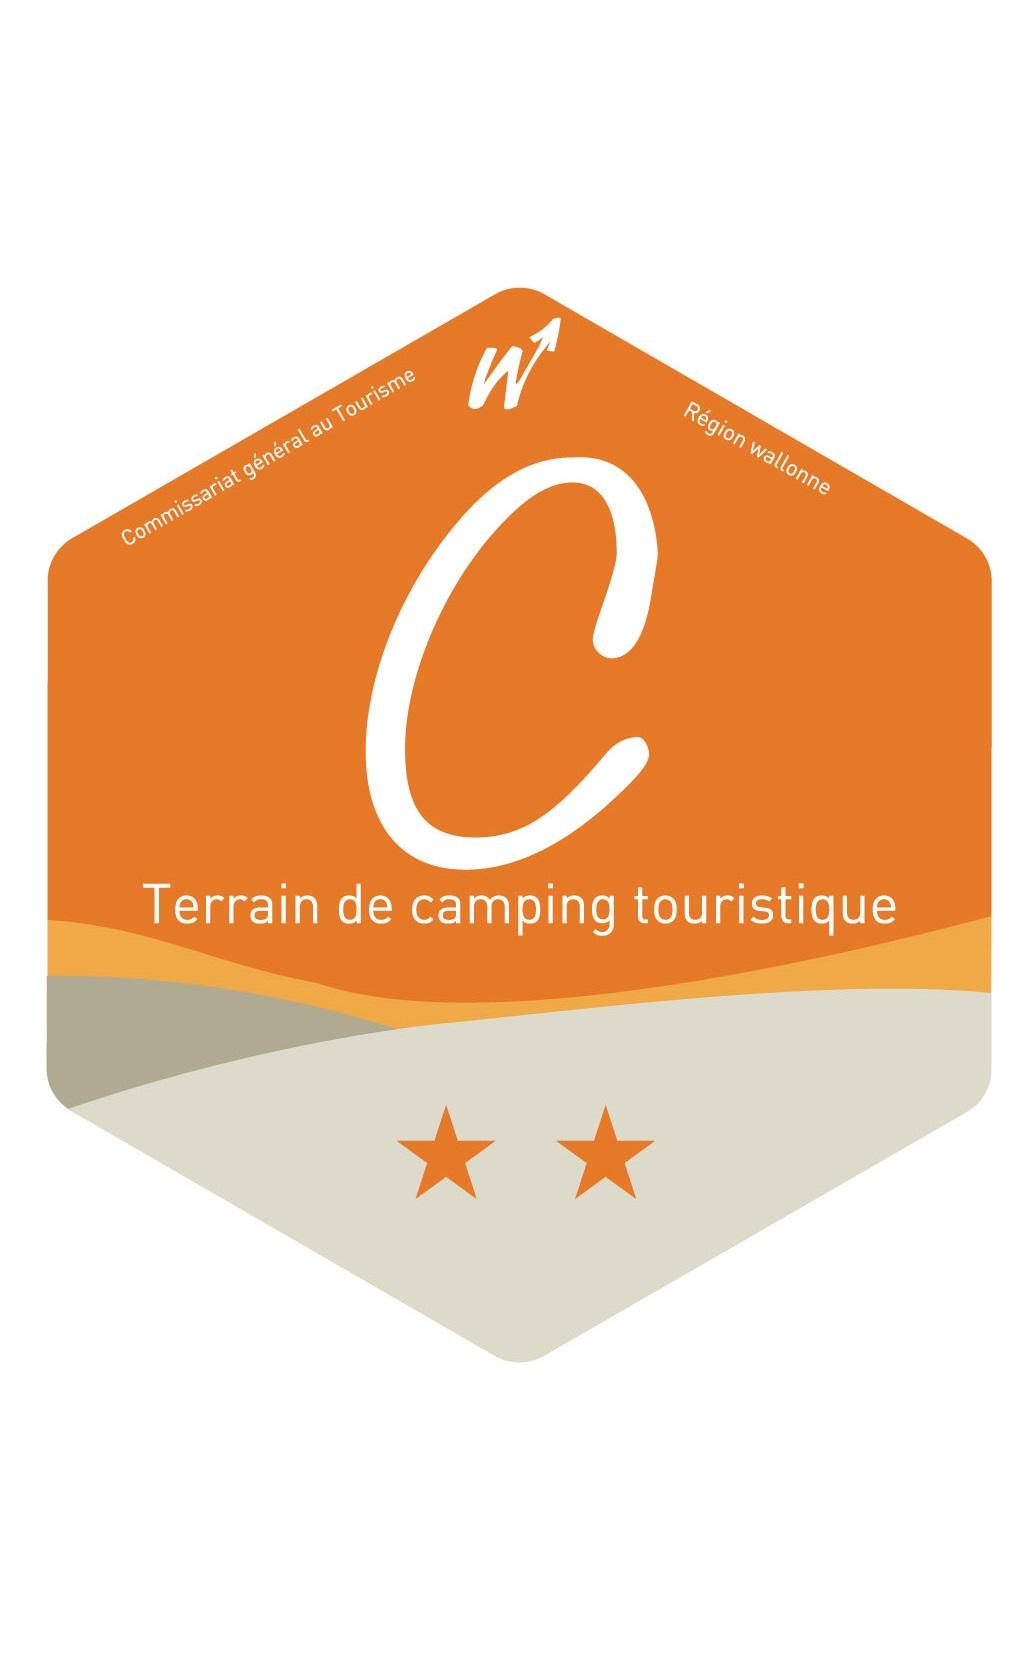 hébergements - camping - 2 étoiles.jpg